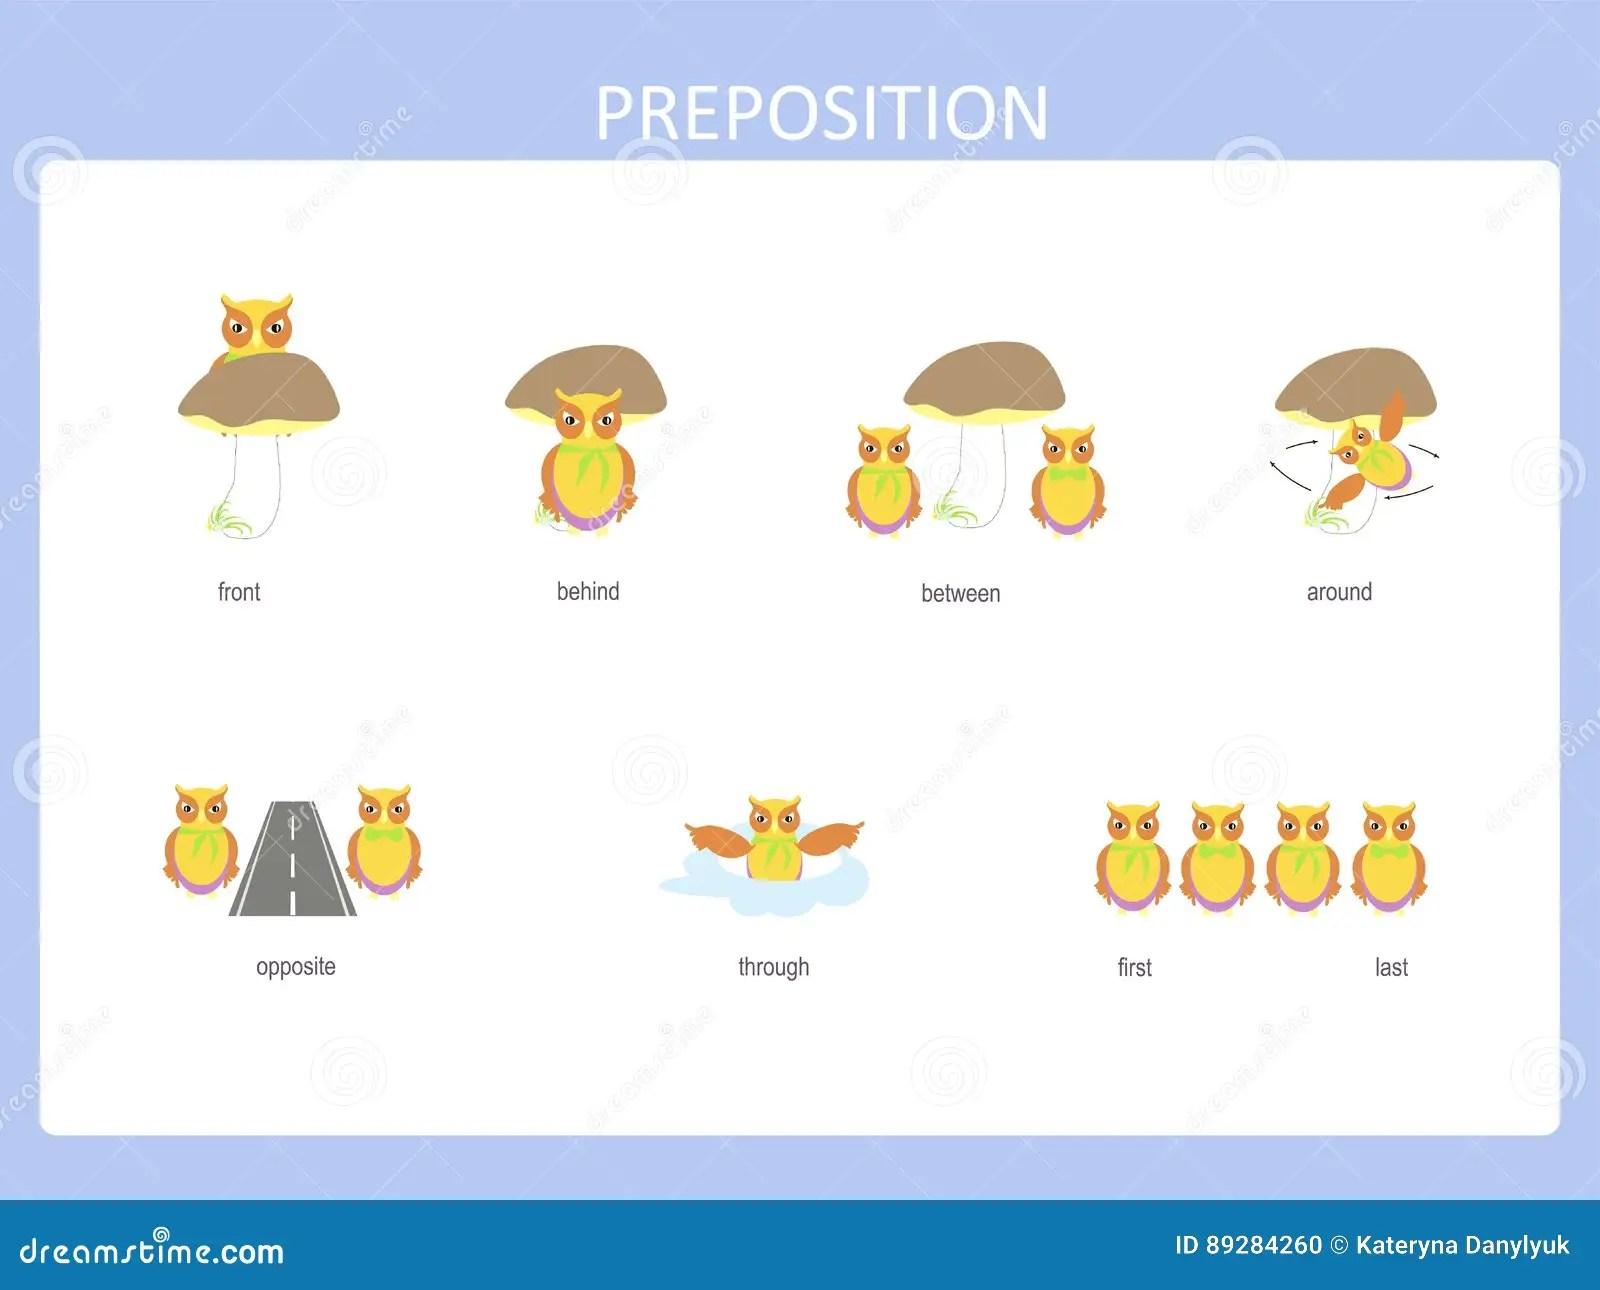 42 Free English Worksheet For Preschool